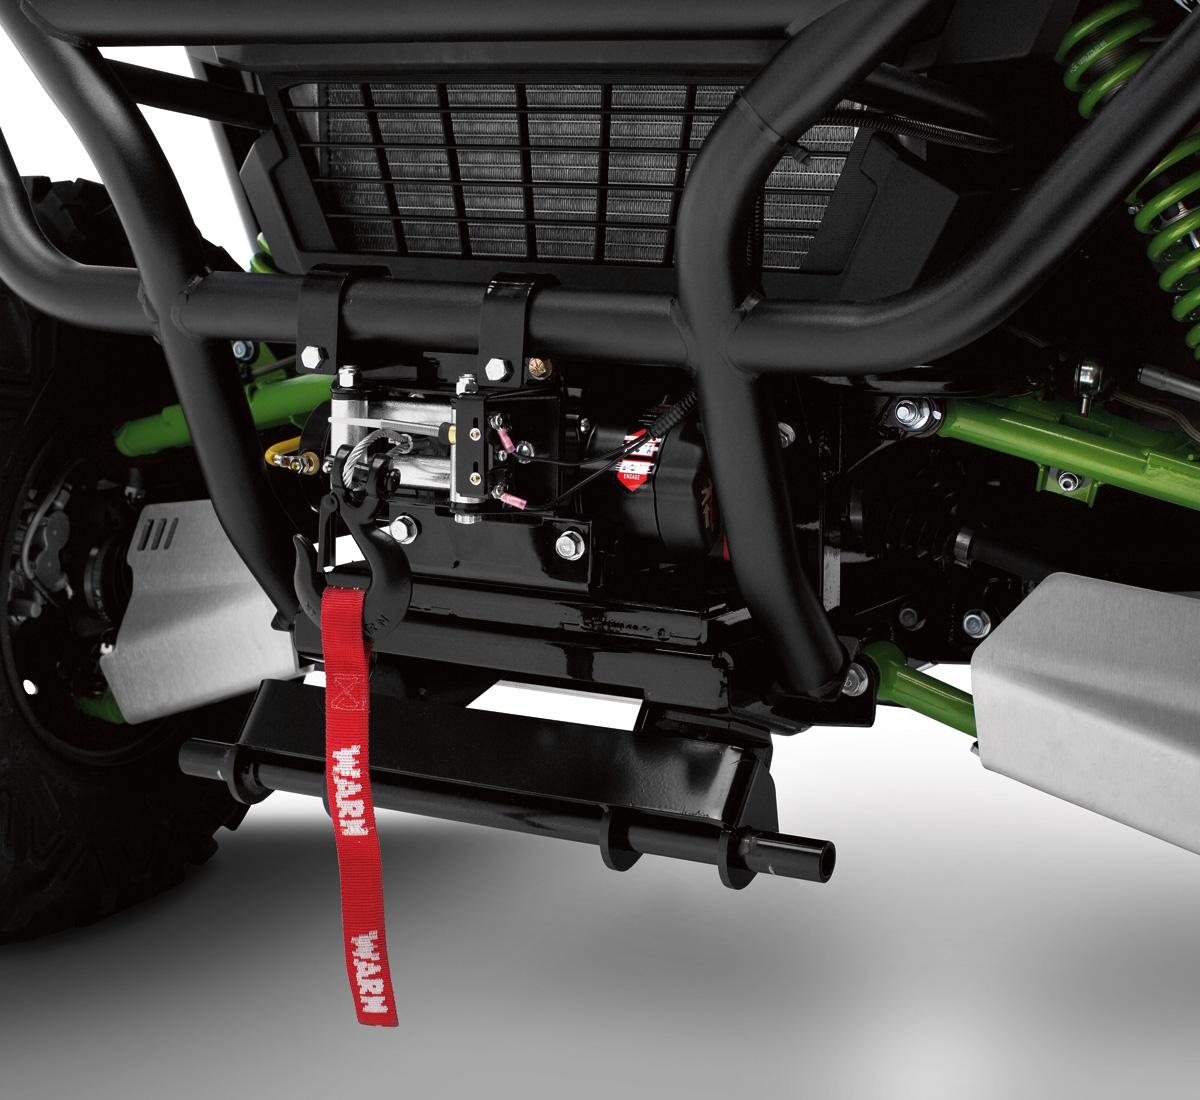 hight resolution of kawasaki teryx winch wiring enthusiast wiring diagrams u2022 kawasaki teryx 4 seater kawasaki teryx winch